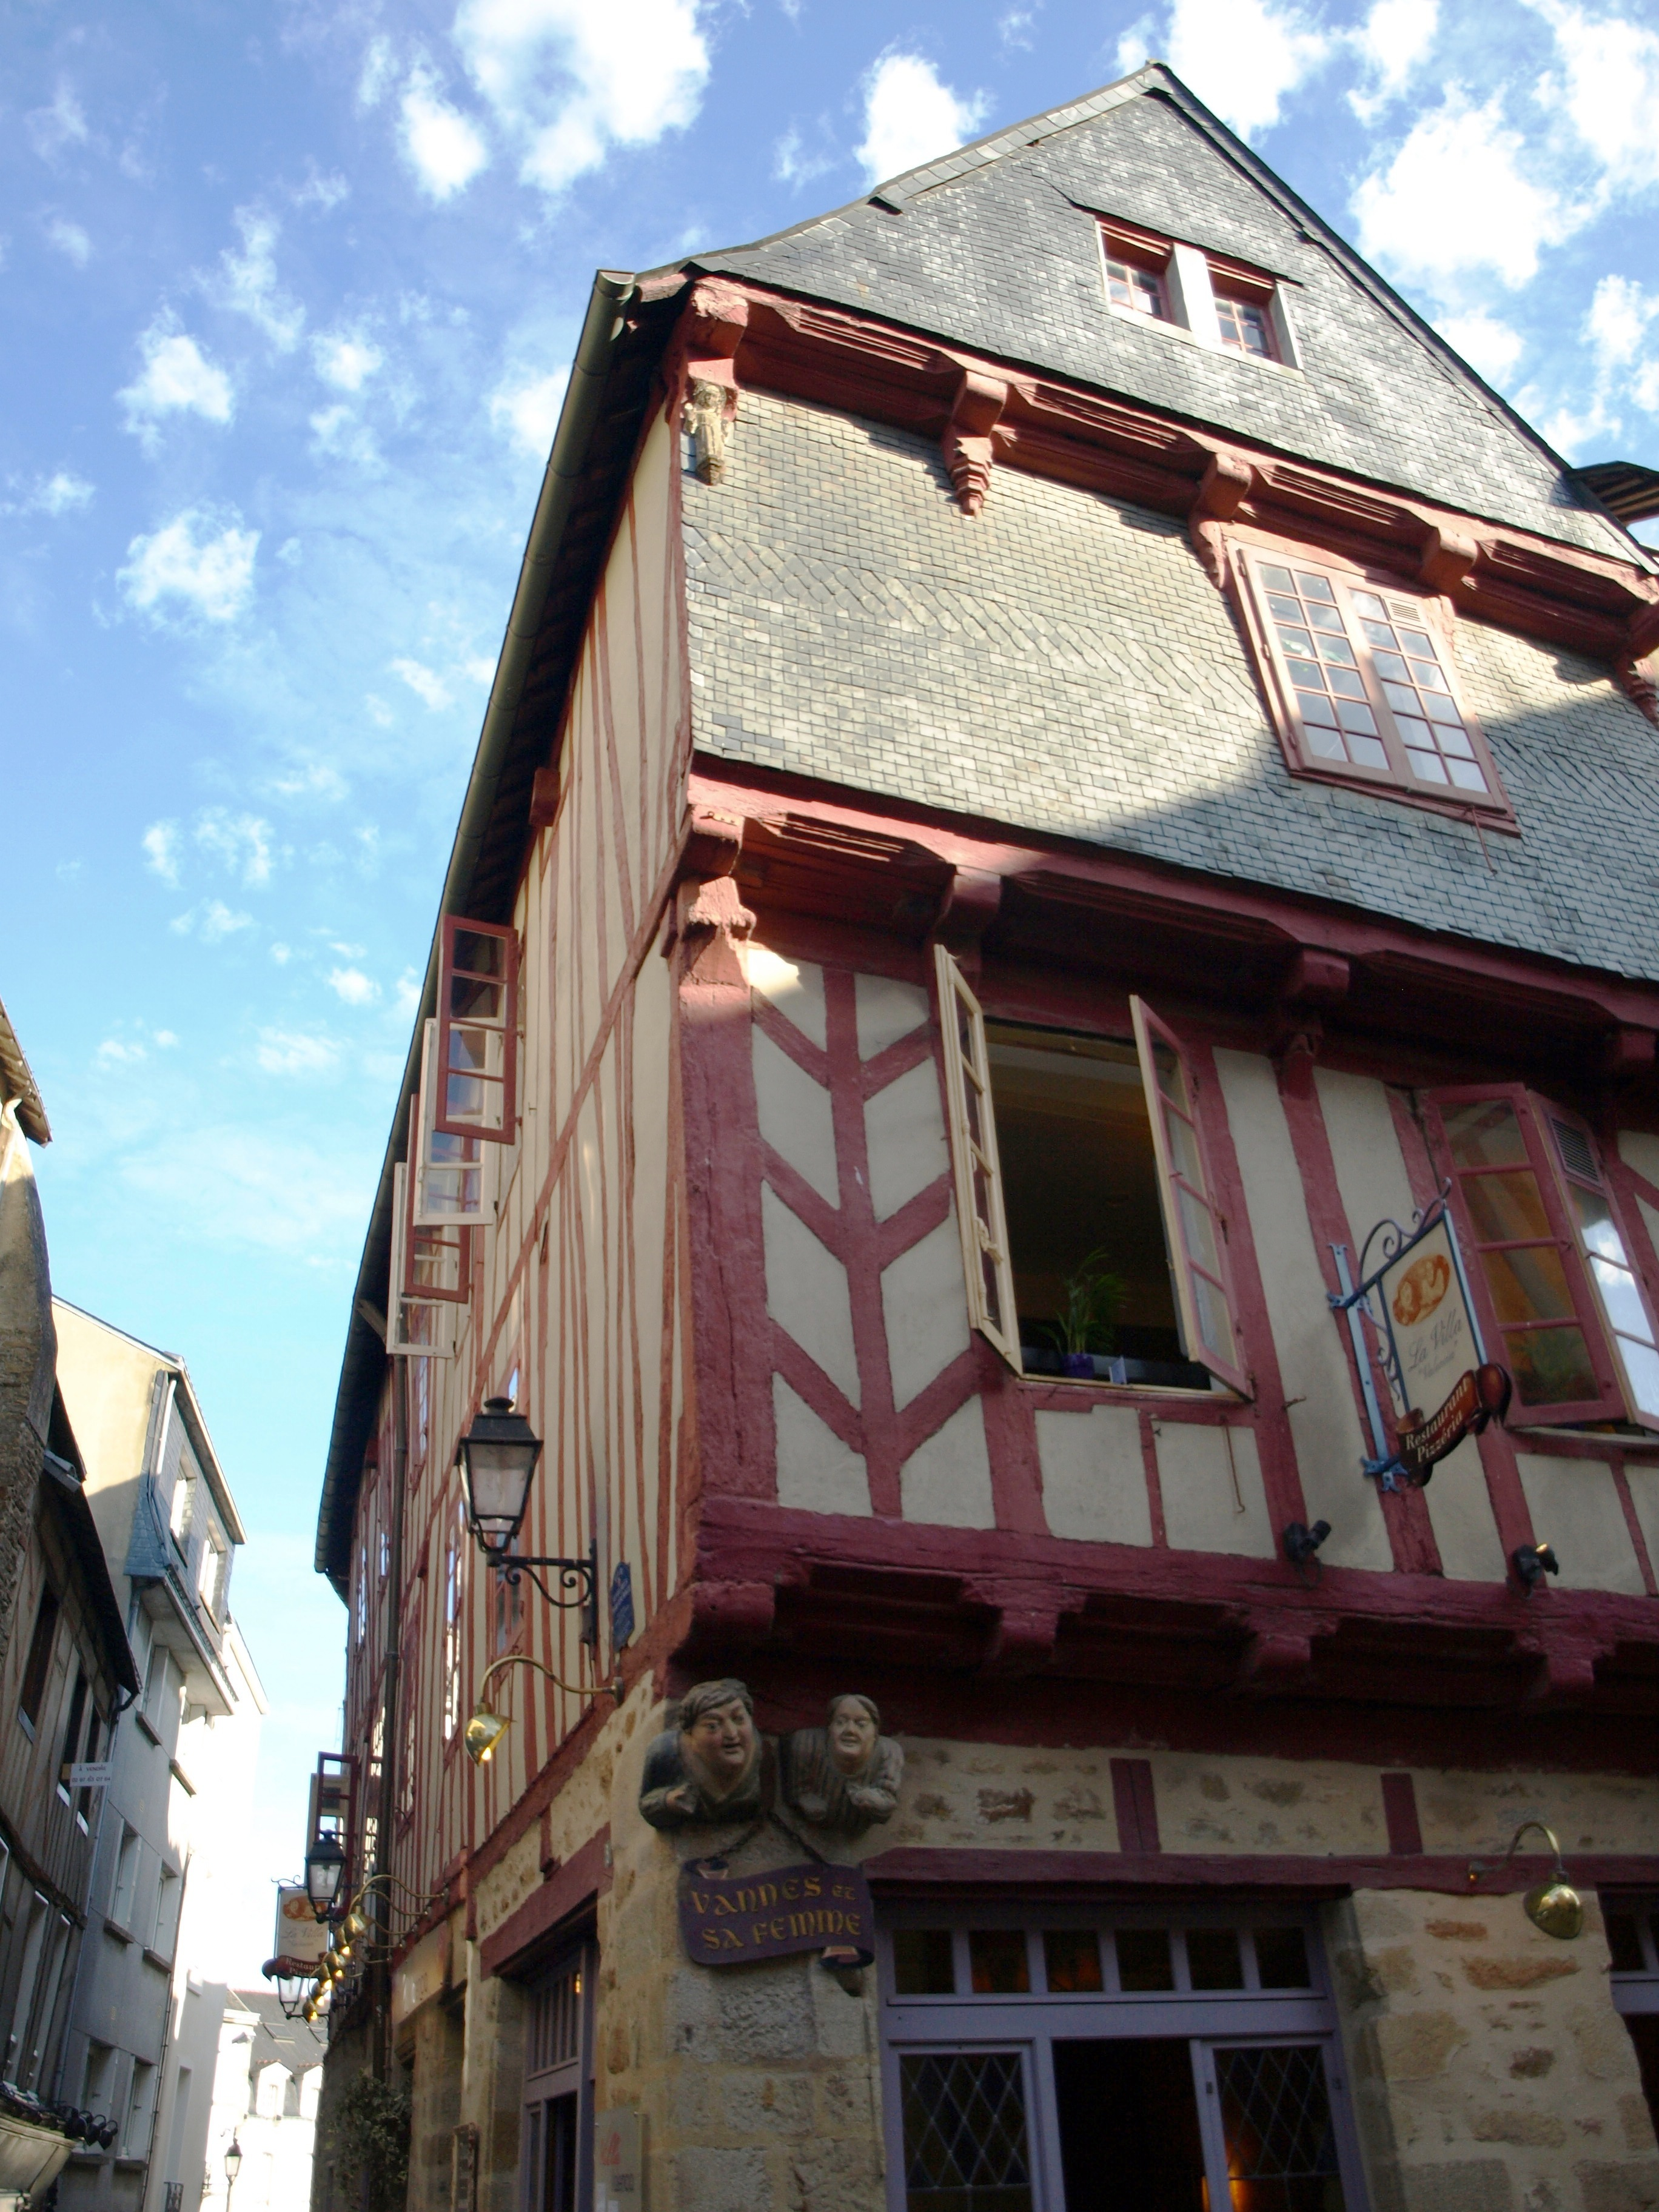 Francie - Bretaň - Vannes, dům ze 16.stol. zvaný Vannes et sa femme